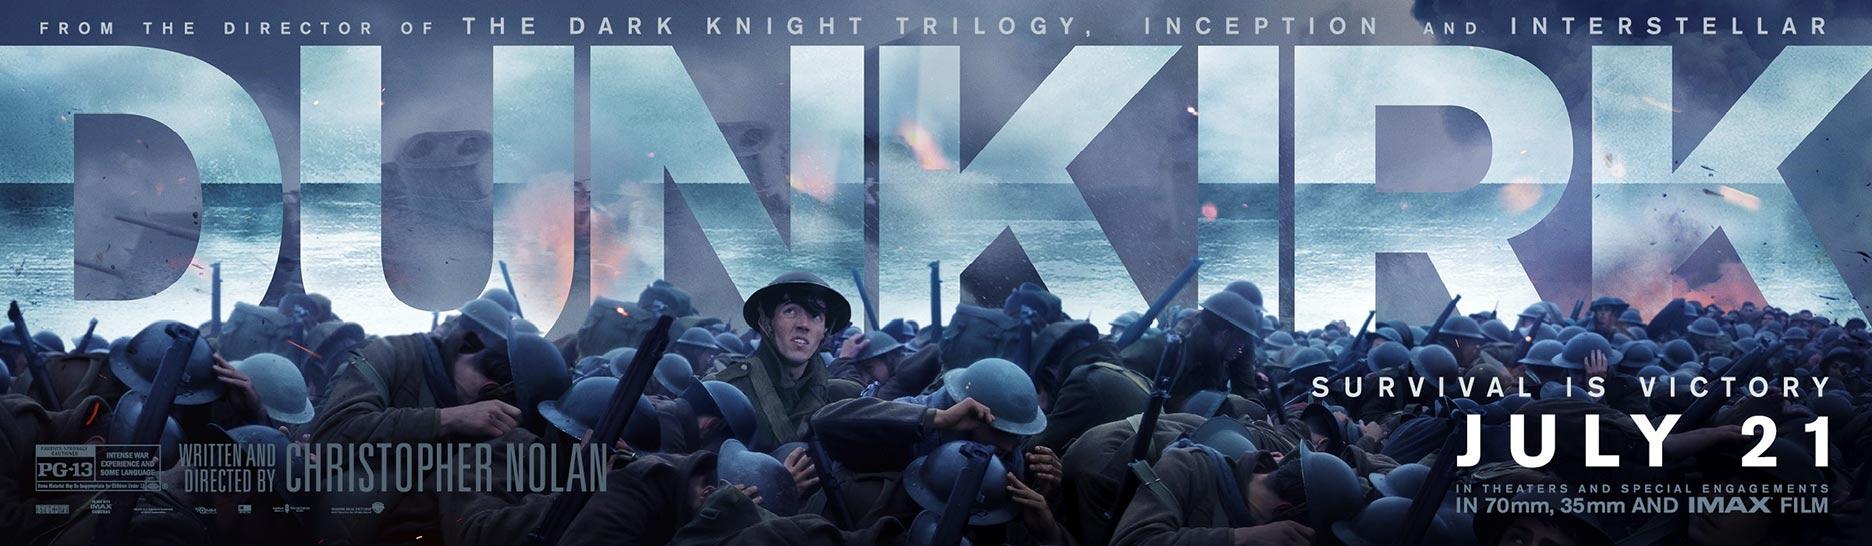 Dunkirk Poster #6